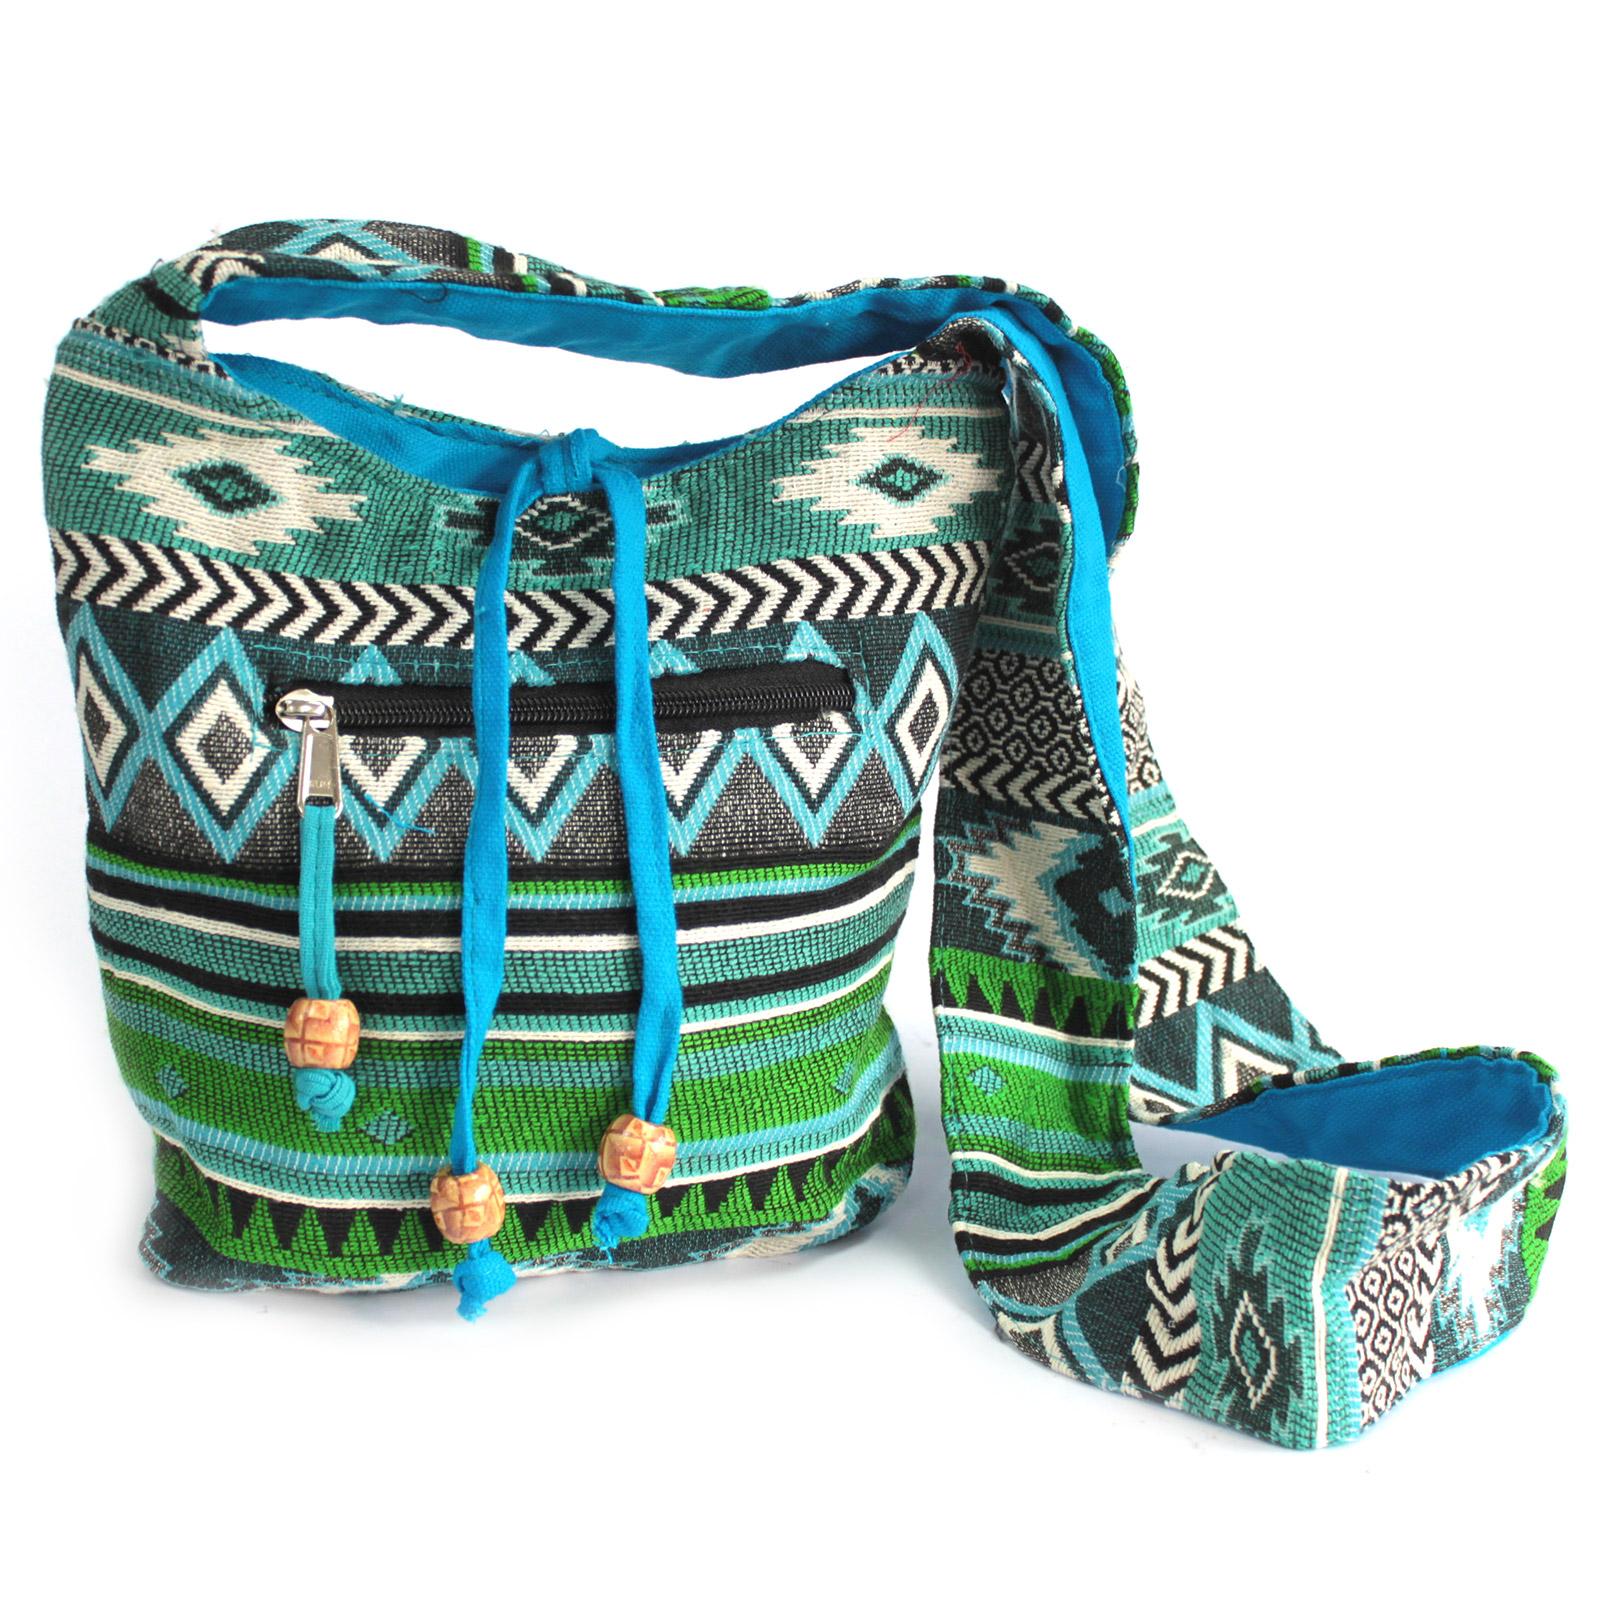 Jacquard Bag - Teal Sling Bag